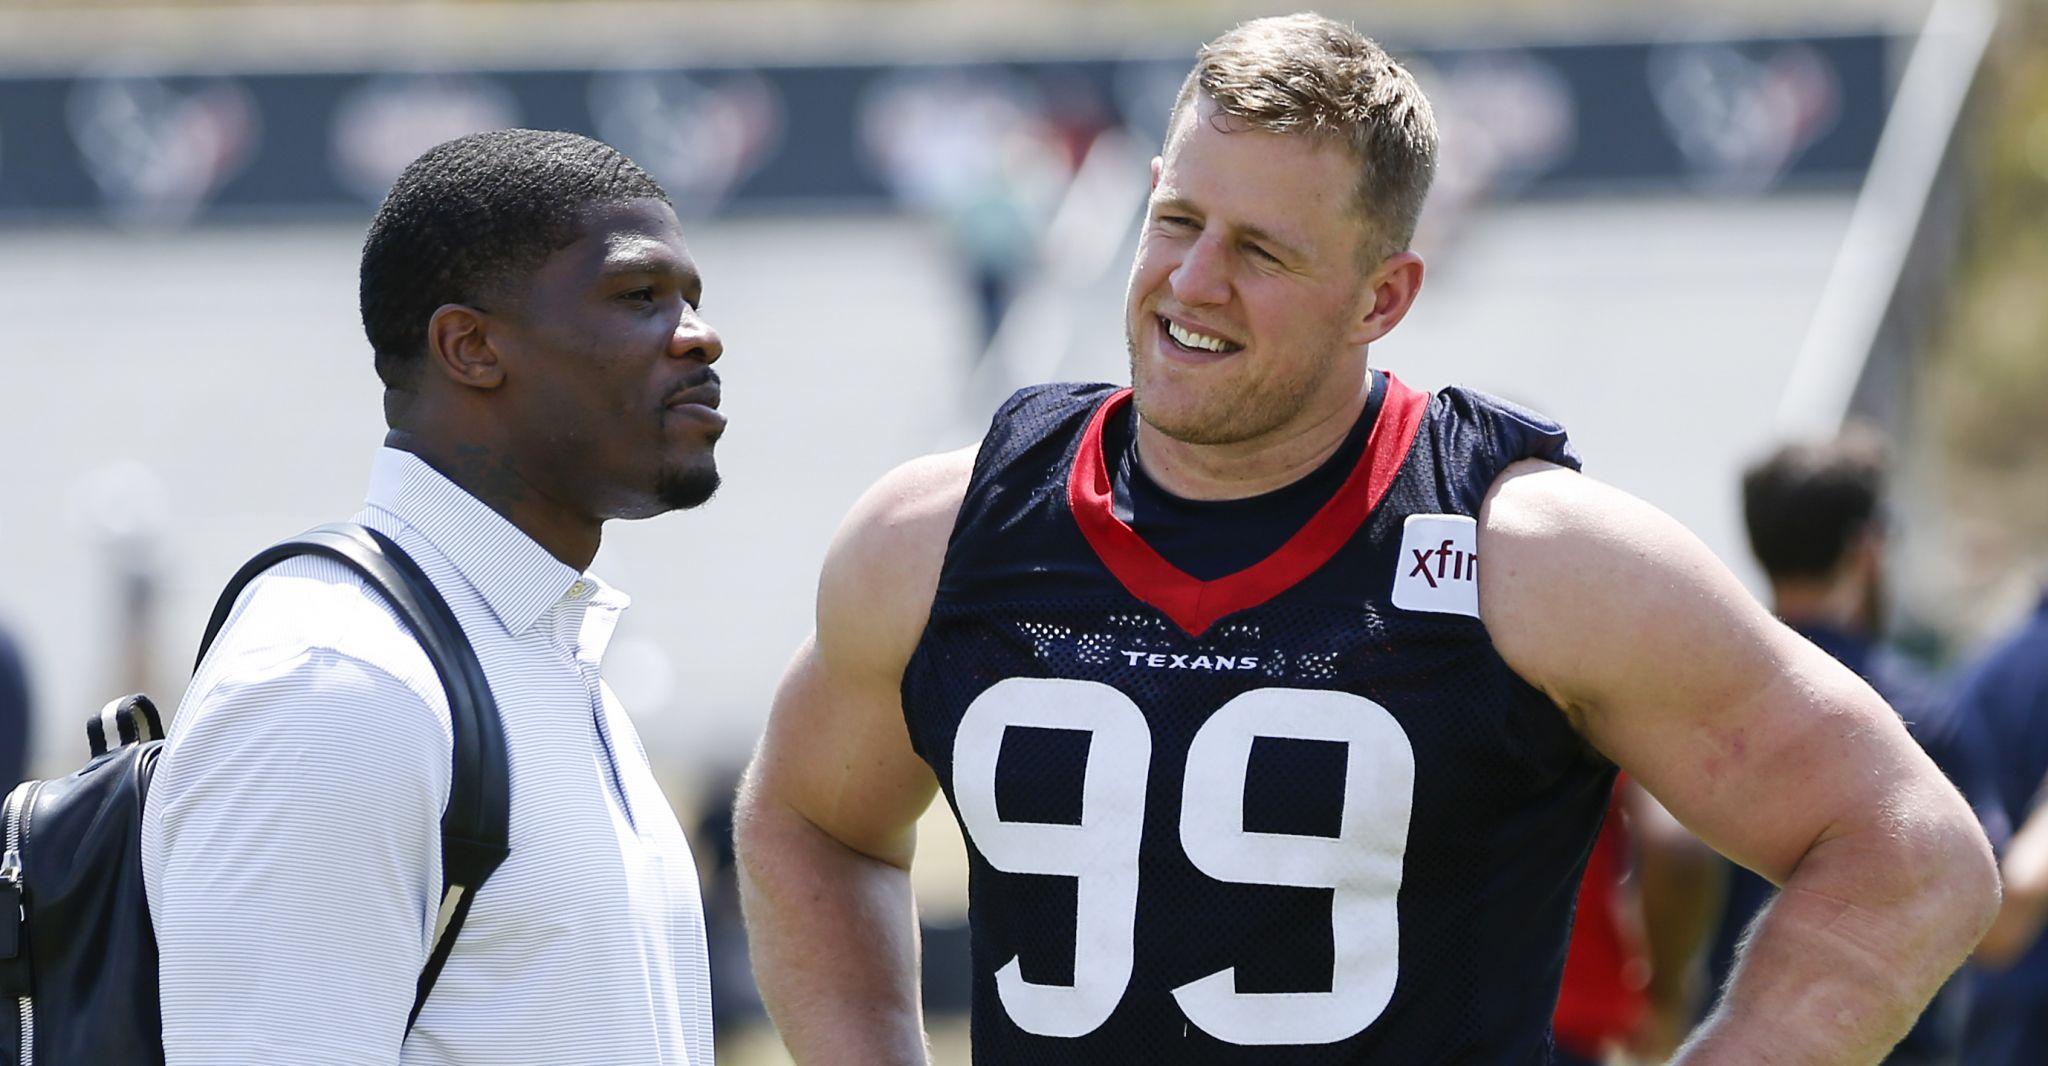 Solomon: Preseason games meaningful this season for returning Texans stars